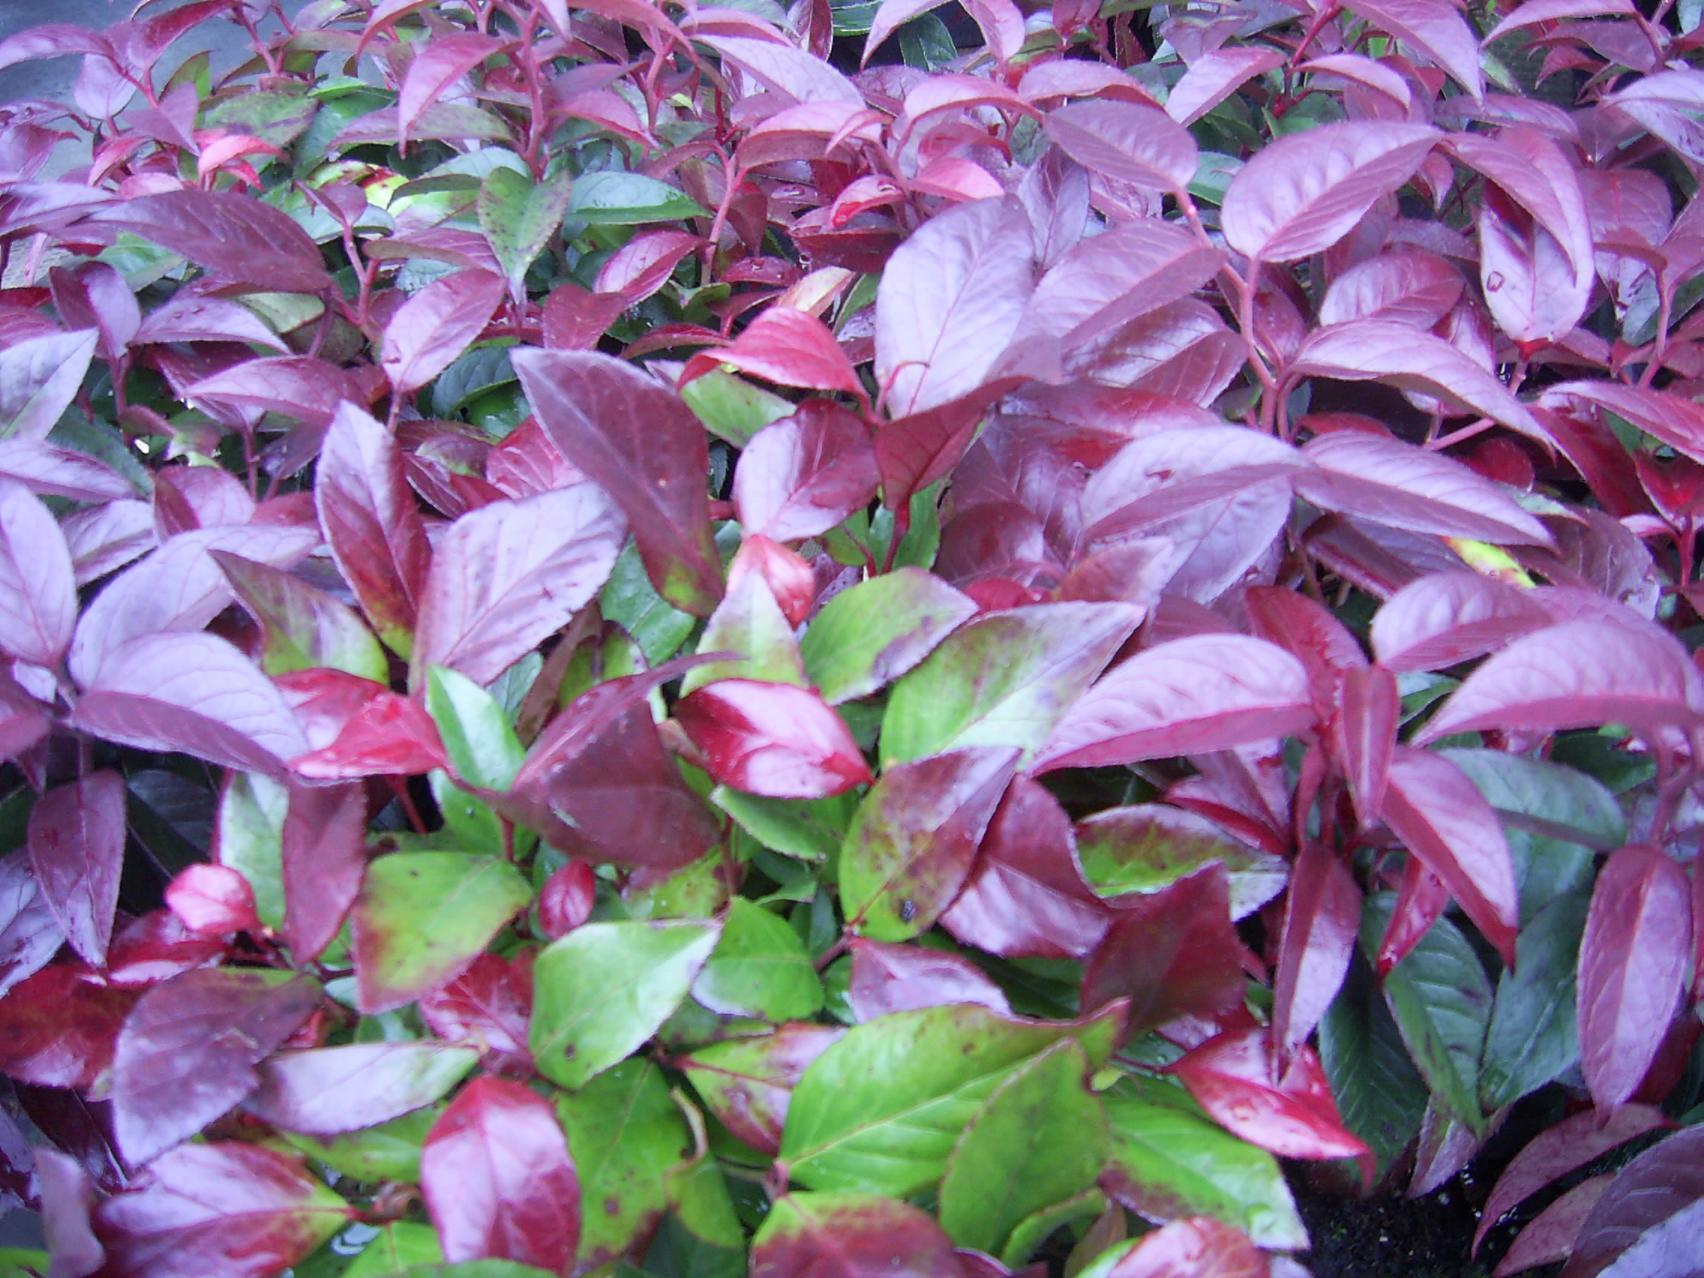 Leucothoë 'Lovita groenblijvende plant in de winter